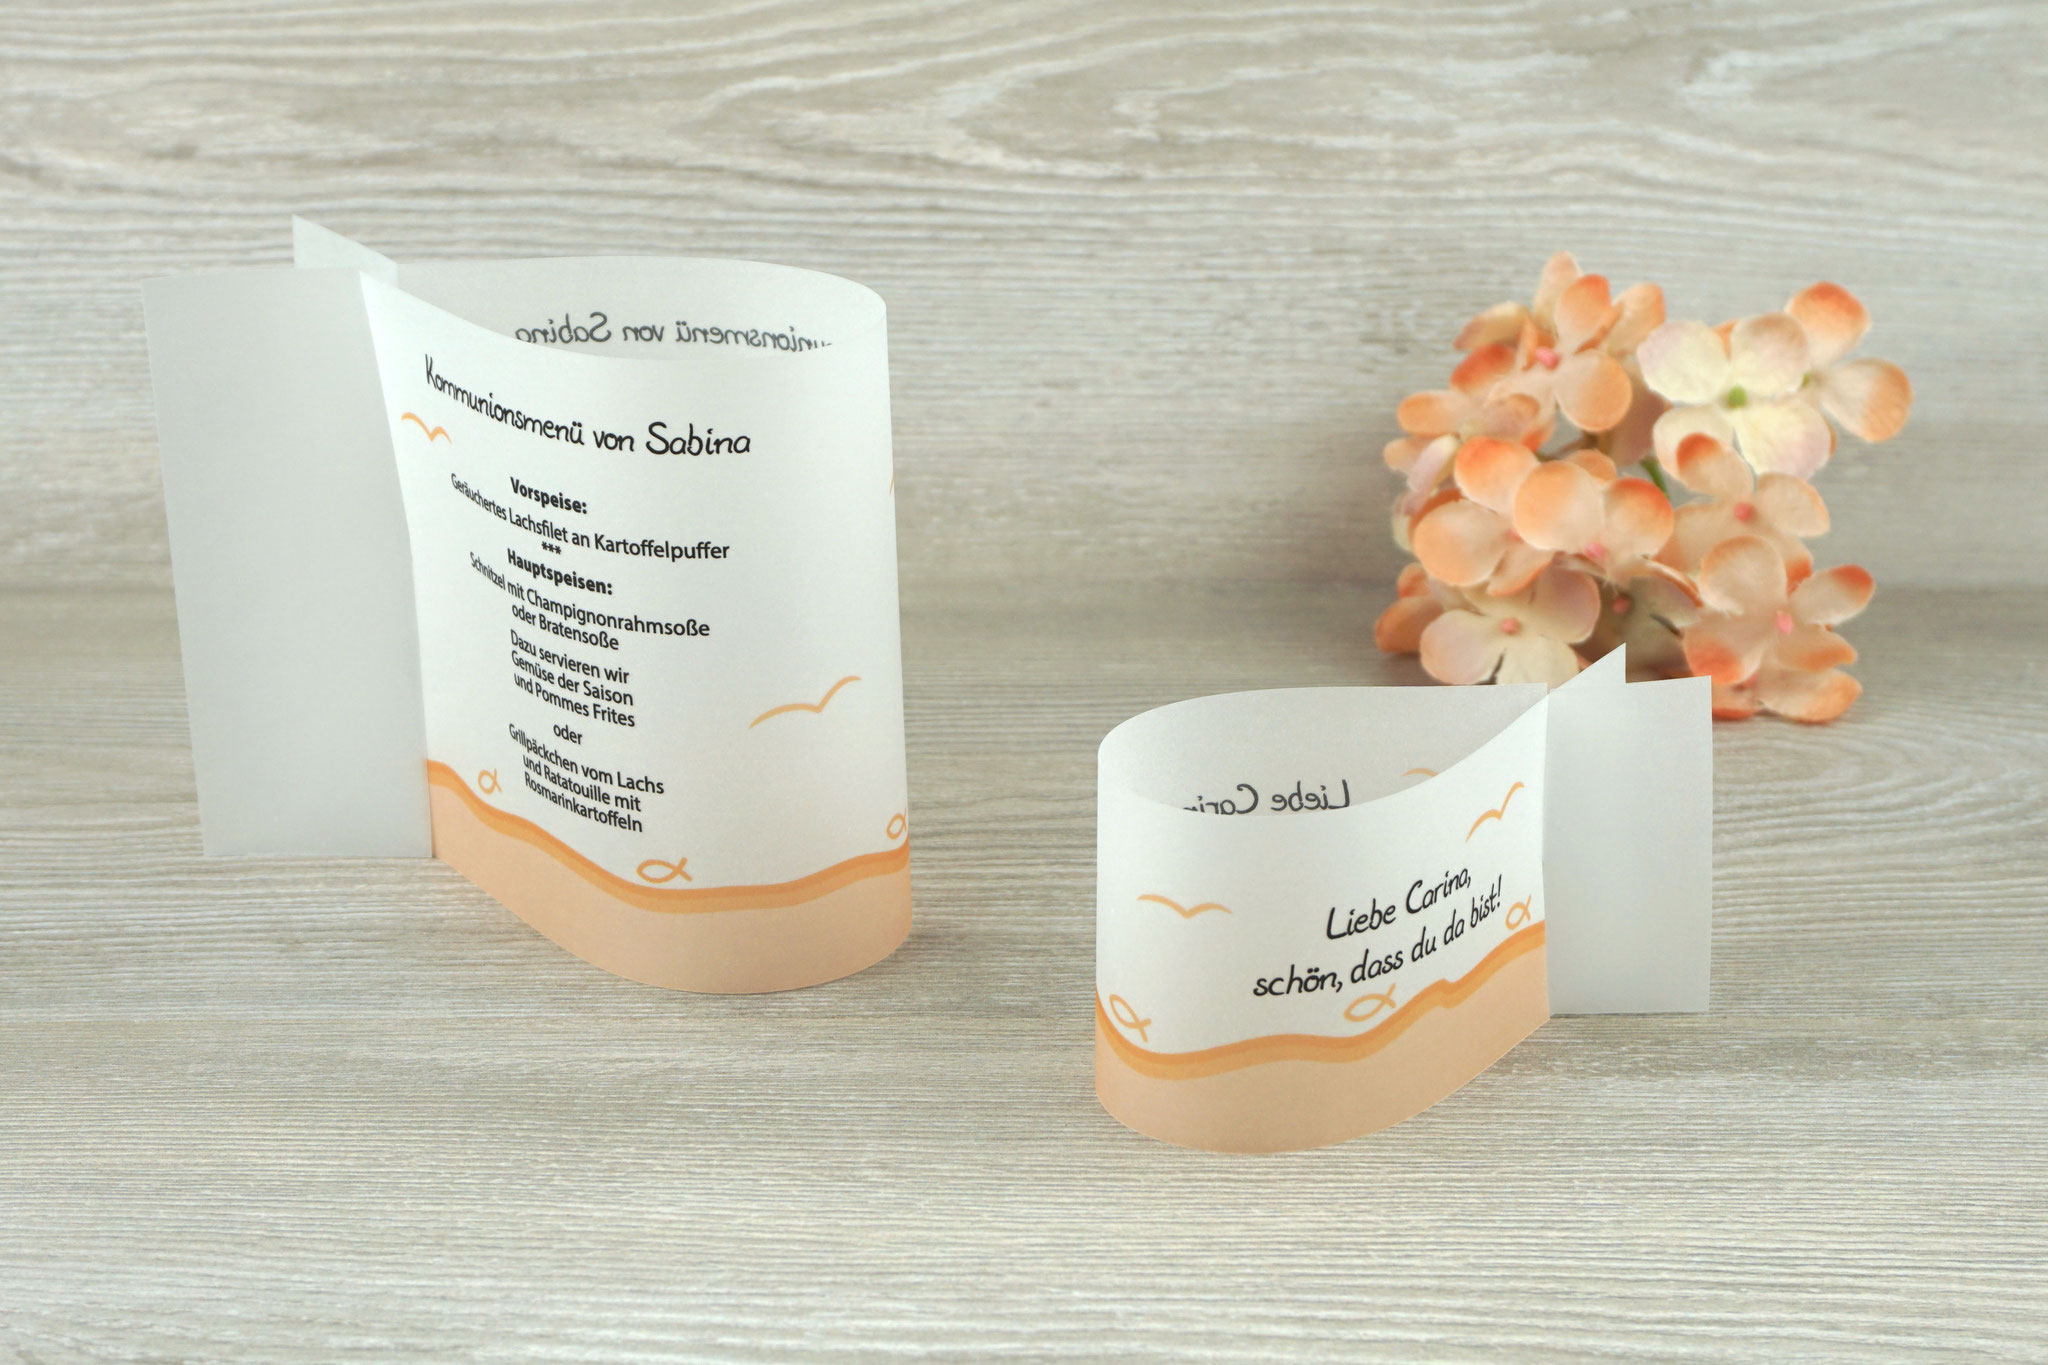 Menükarte & Platzkarte Fischform, Design Fisch Silhouette apricot - Sonderwunsch unterer Rand apricot & Möven